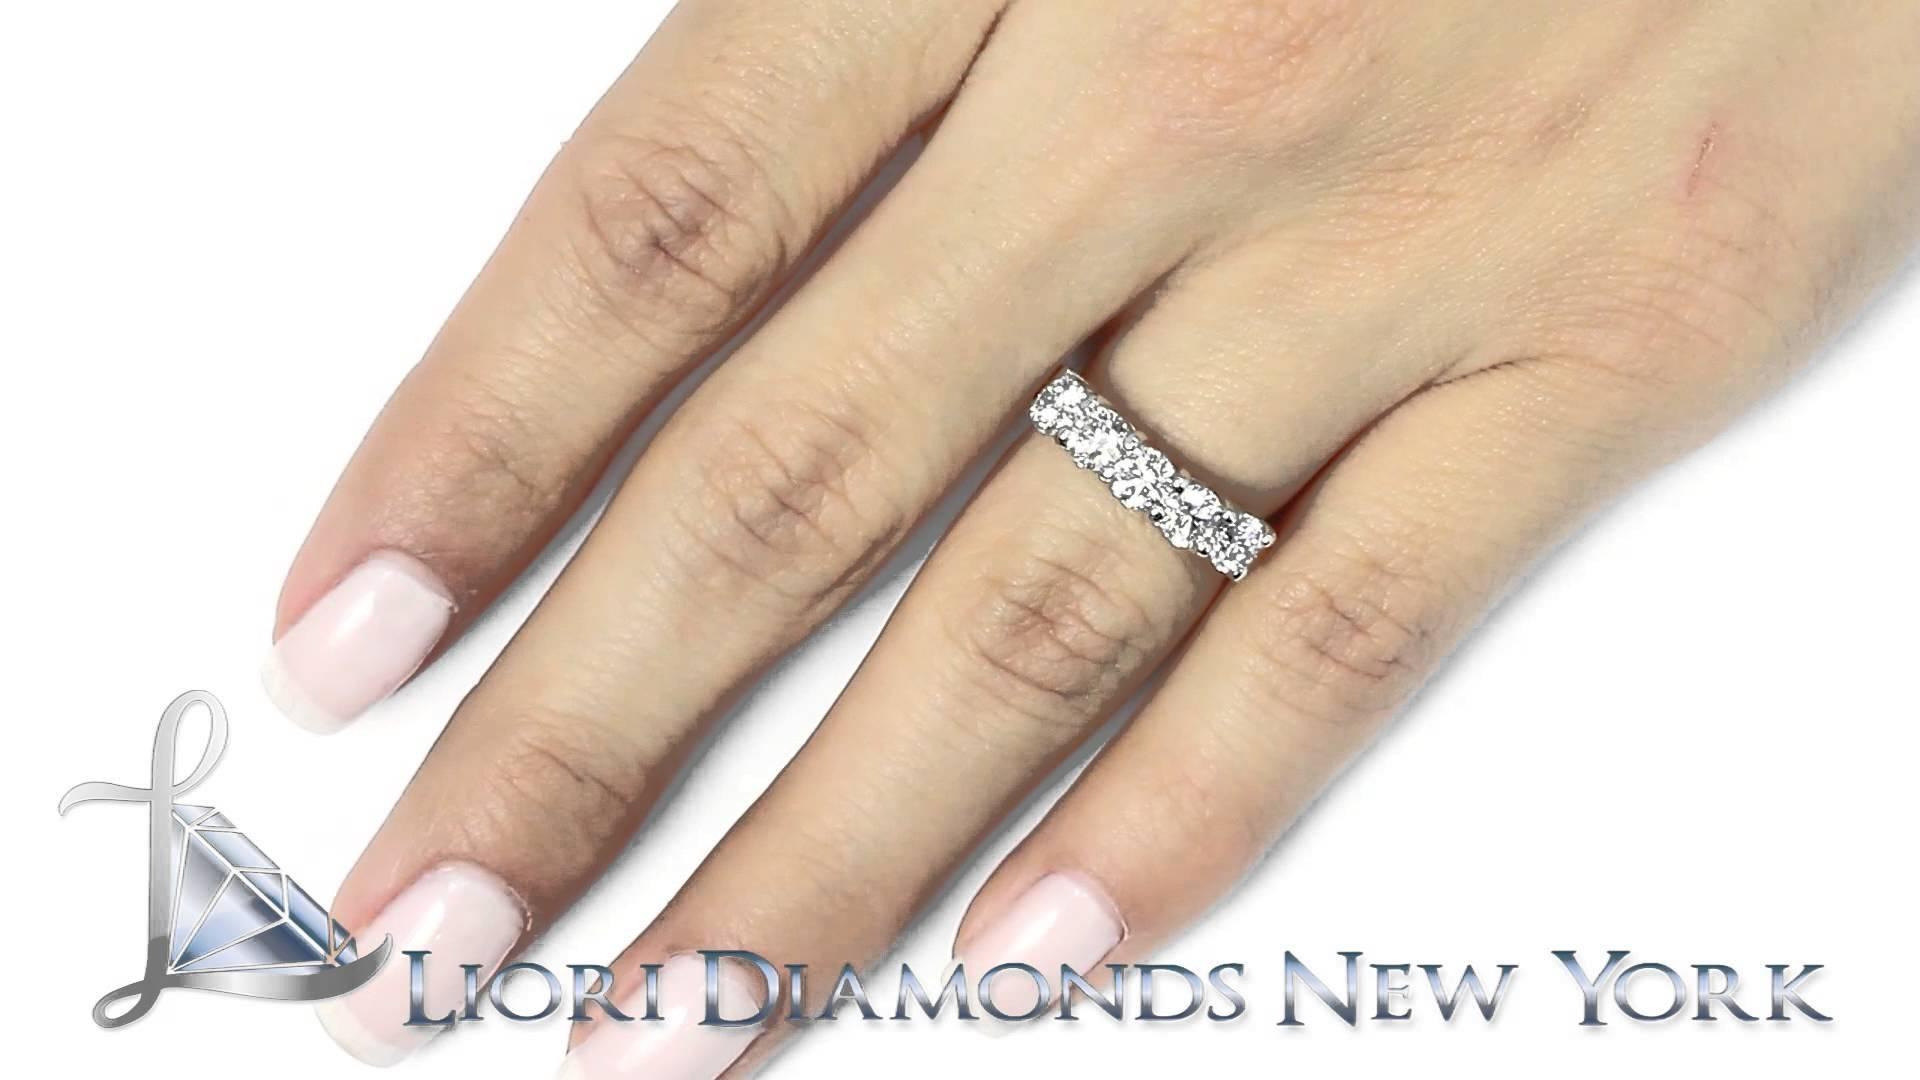 Wba 37 – 2.00 Carat E Vs1 5 Stone Diamond Wedding Band Anniversary For Most Up To Date Five Stone Diamond Anniversary Rings (Gallery 2 of 25)